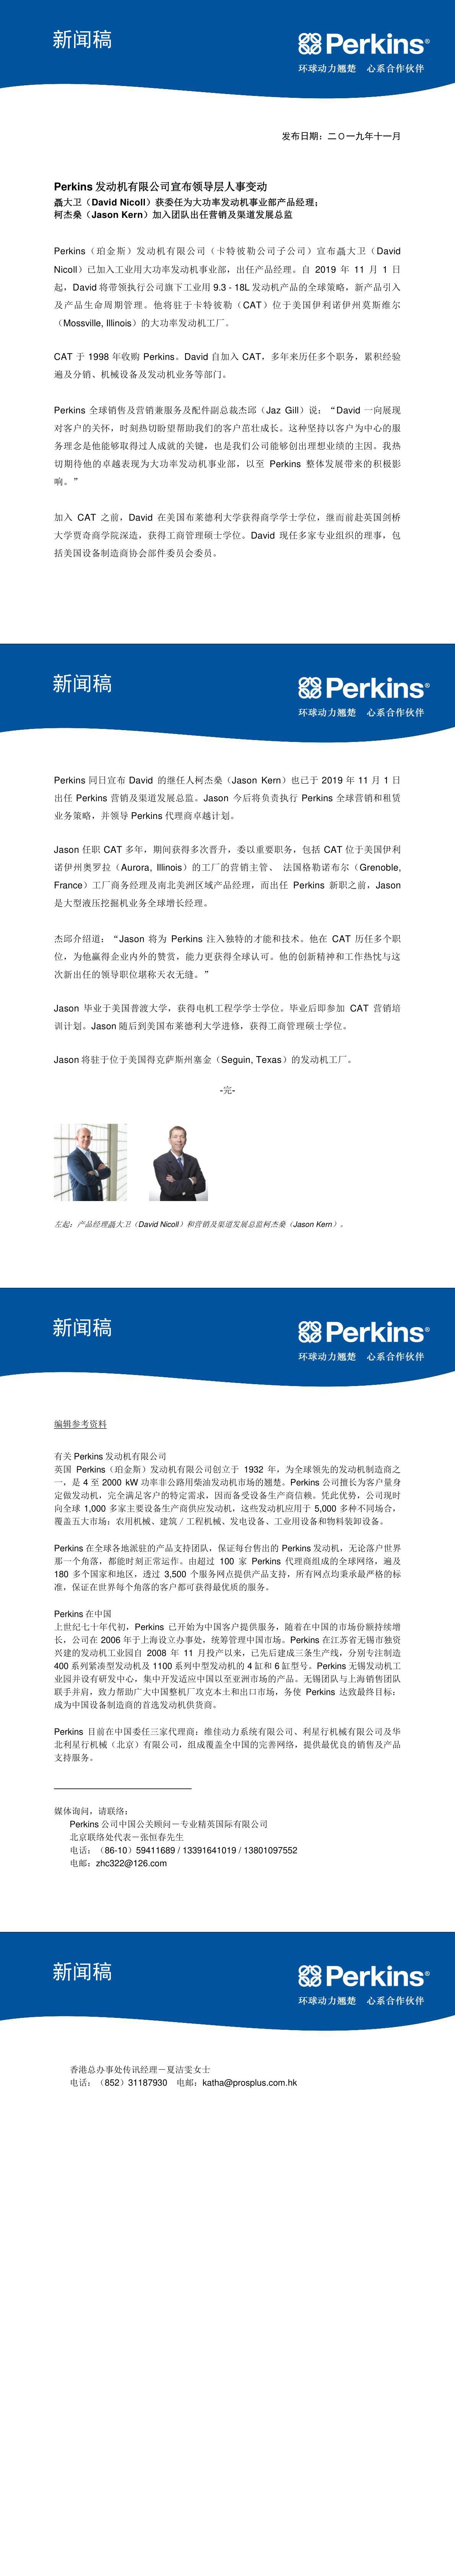 PerkinsEnginesCompanyLimitedannouncesleadershipchanges__(Chi).png